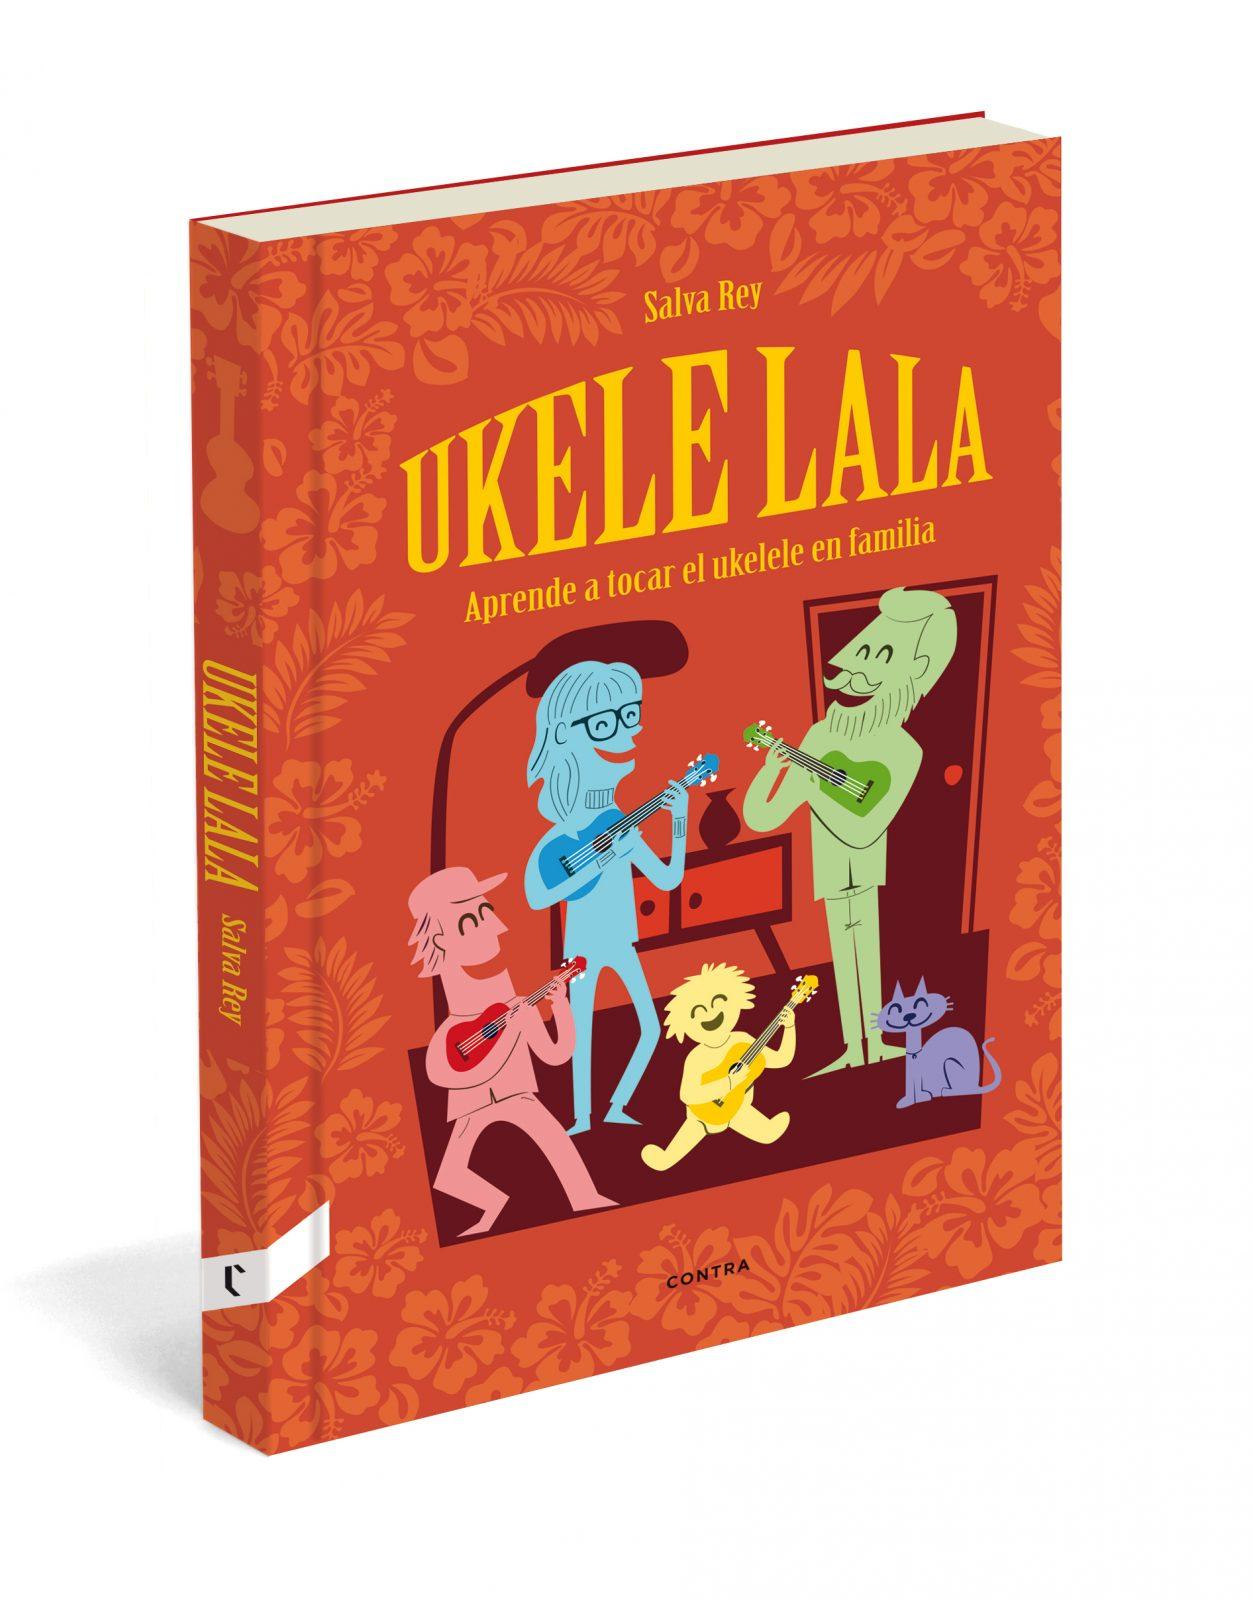 Ukelelala_medium